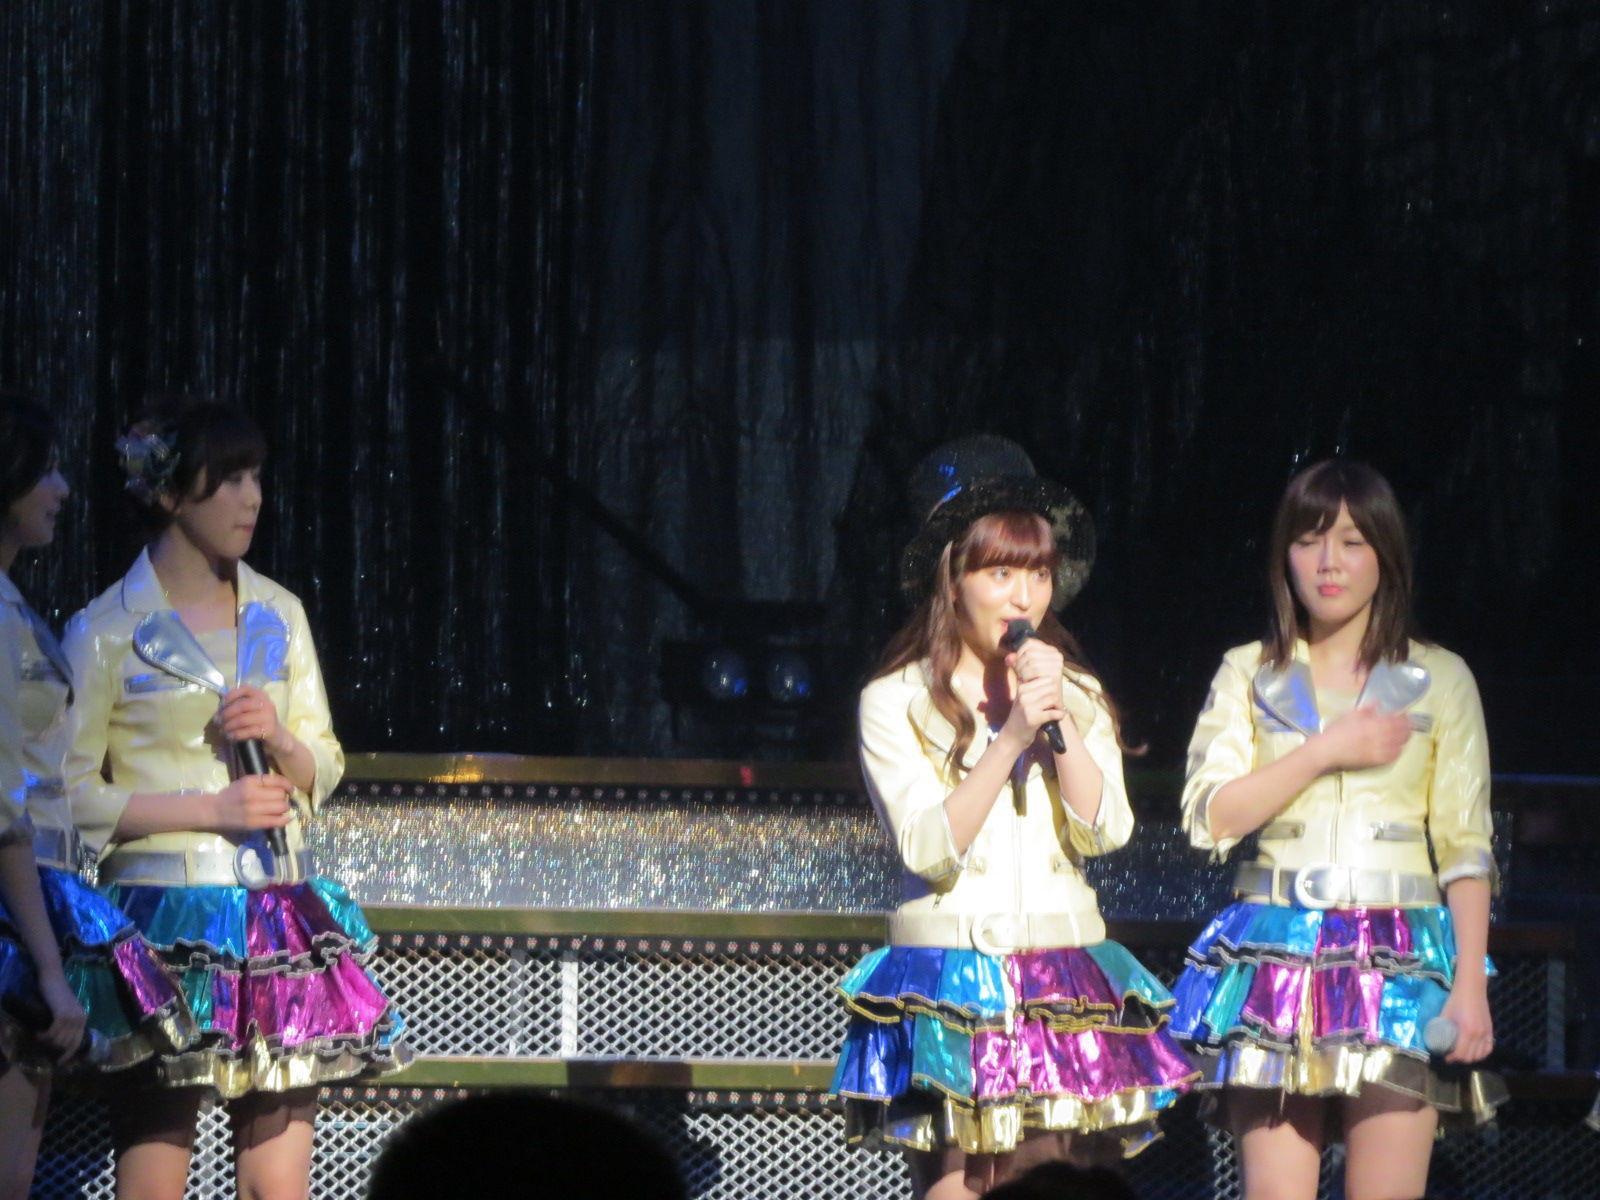 umeda ayaka graduation NMB48梅田彩佳が卒業発表-03